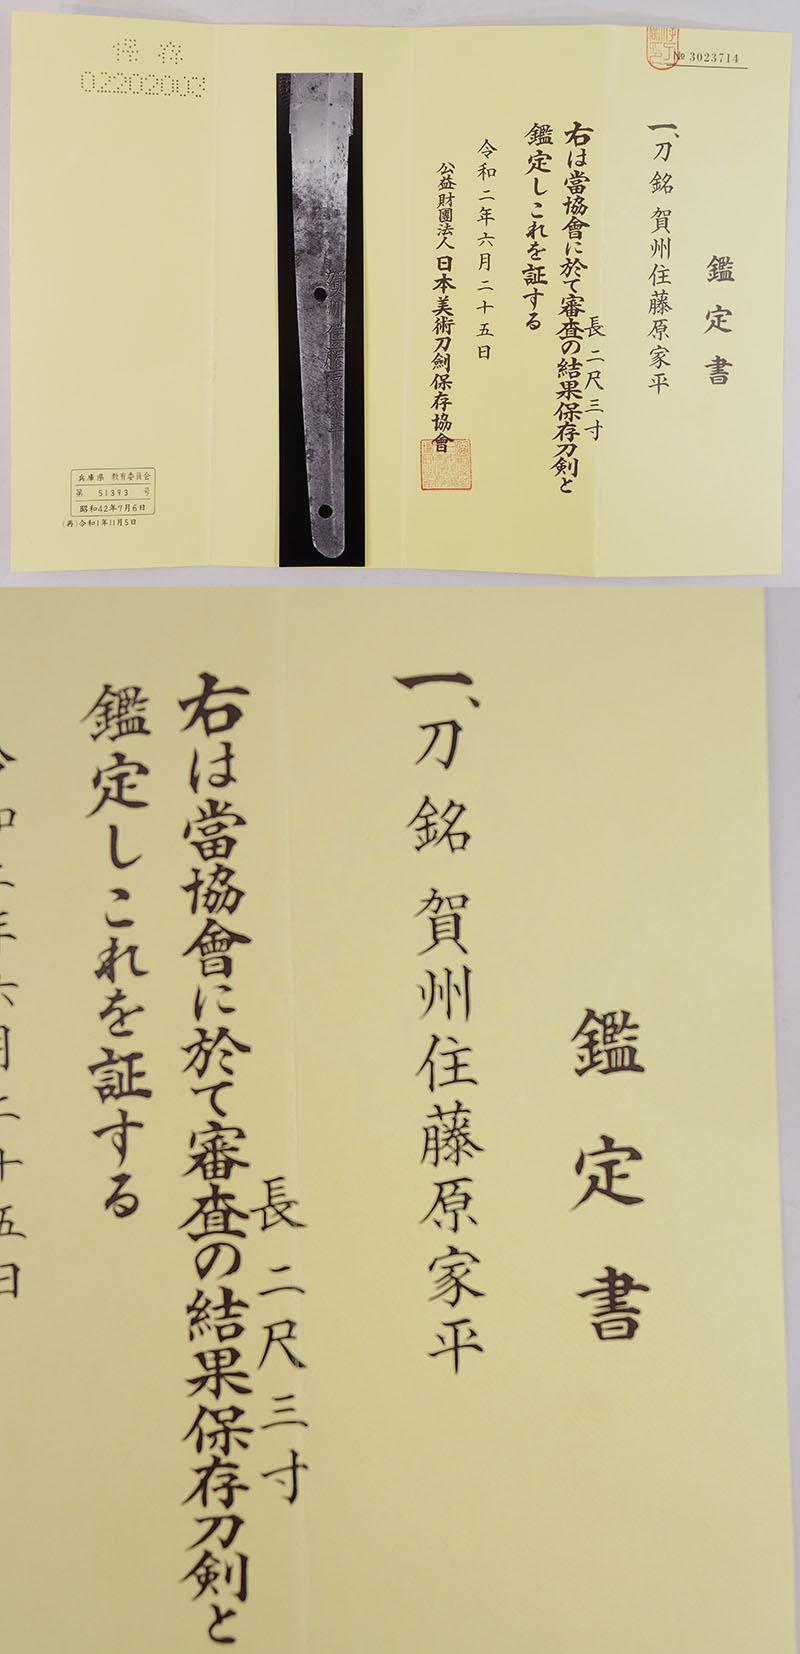 刀 賀州住藤原家平 Picture of Certificate